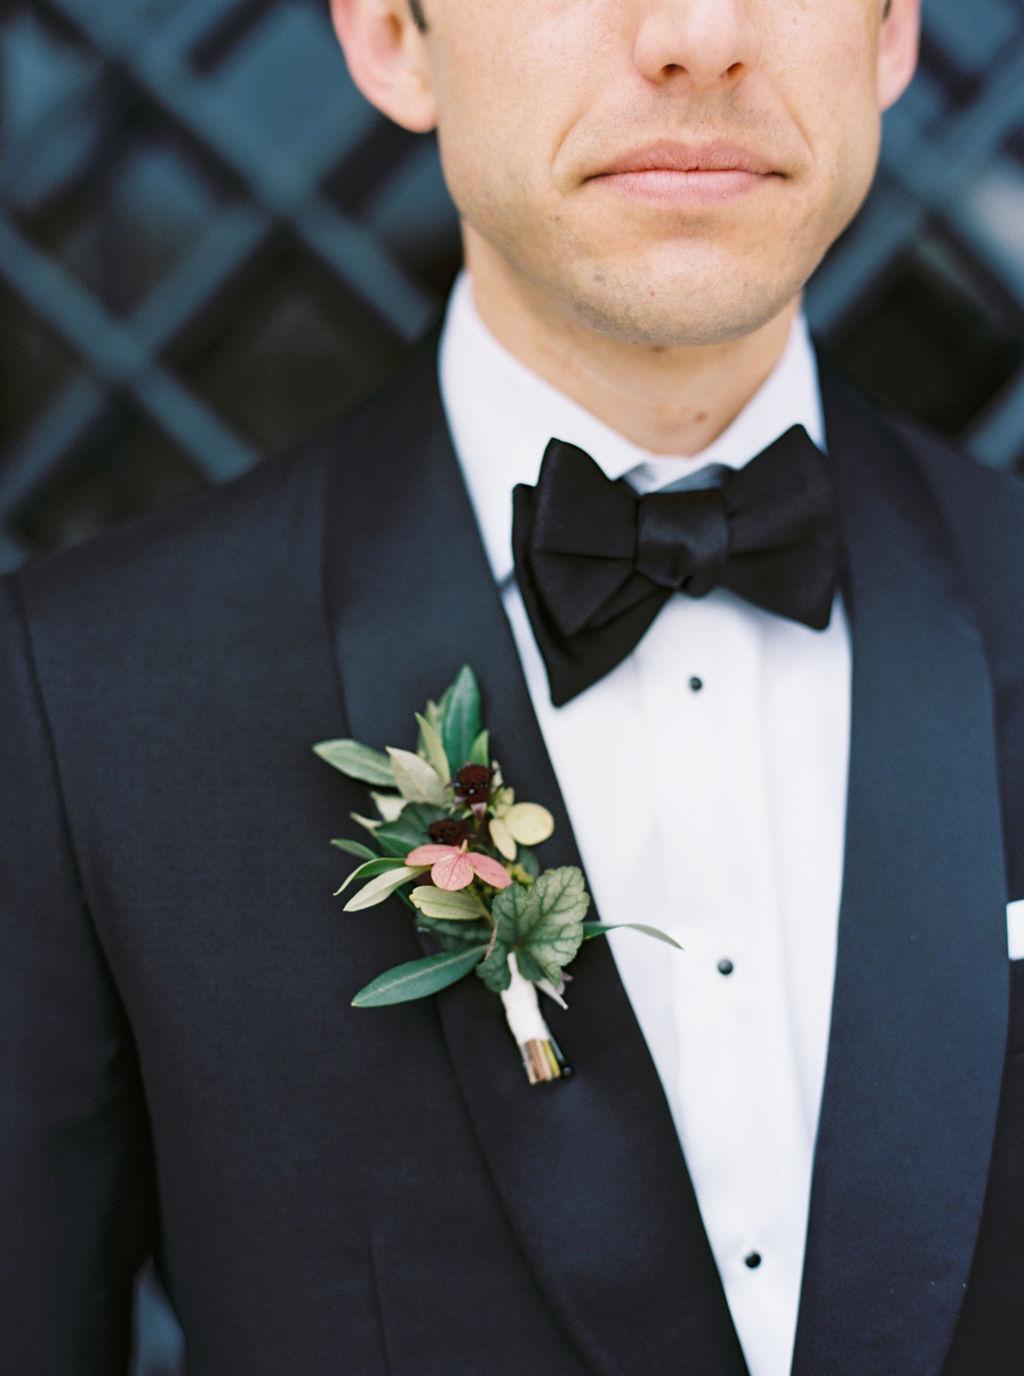 Kyle-Menna-Wedding-krmorenophoto-306.jpg